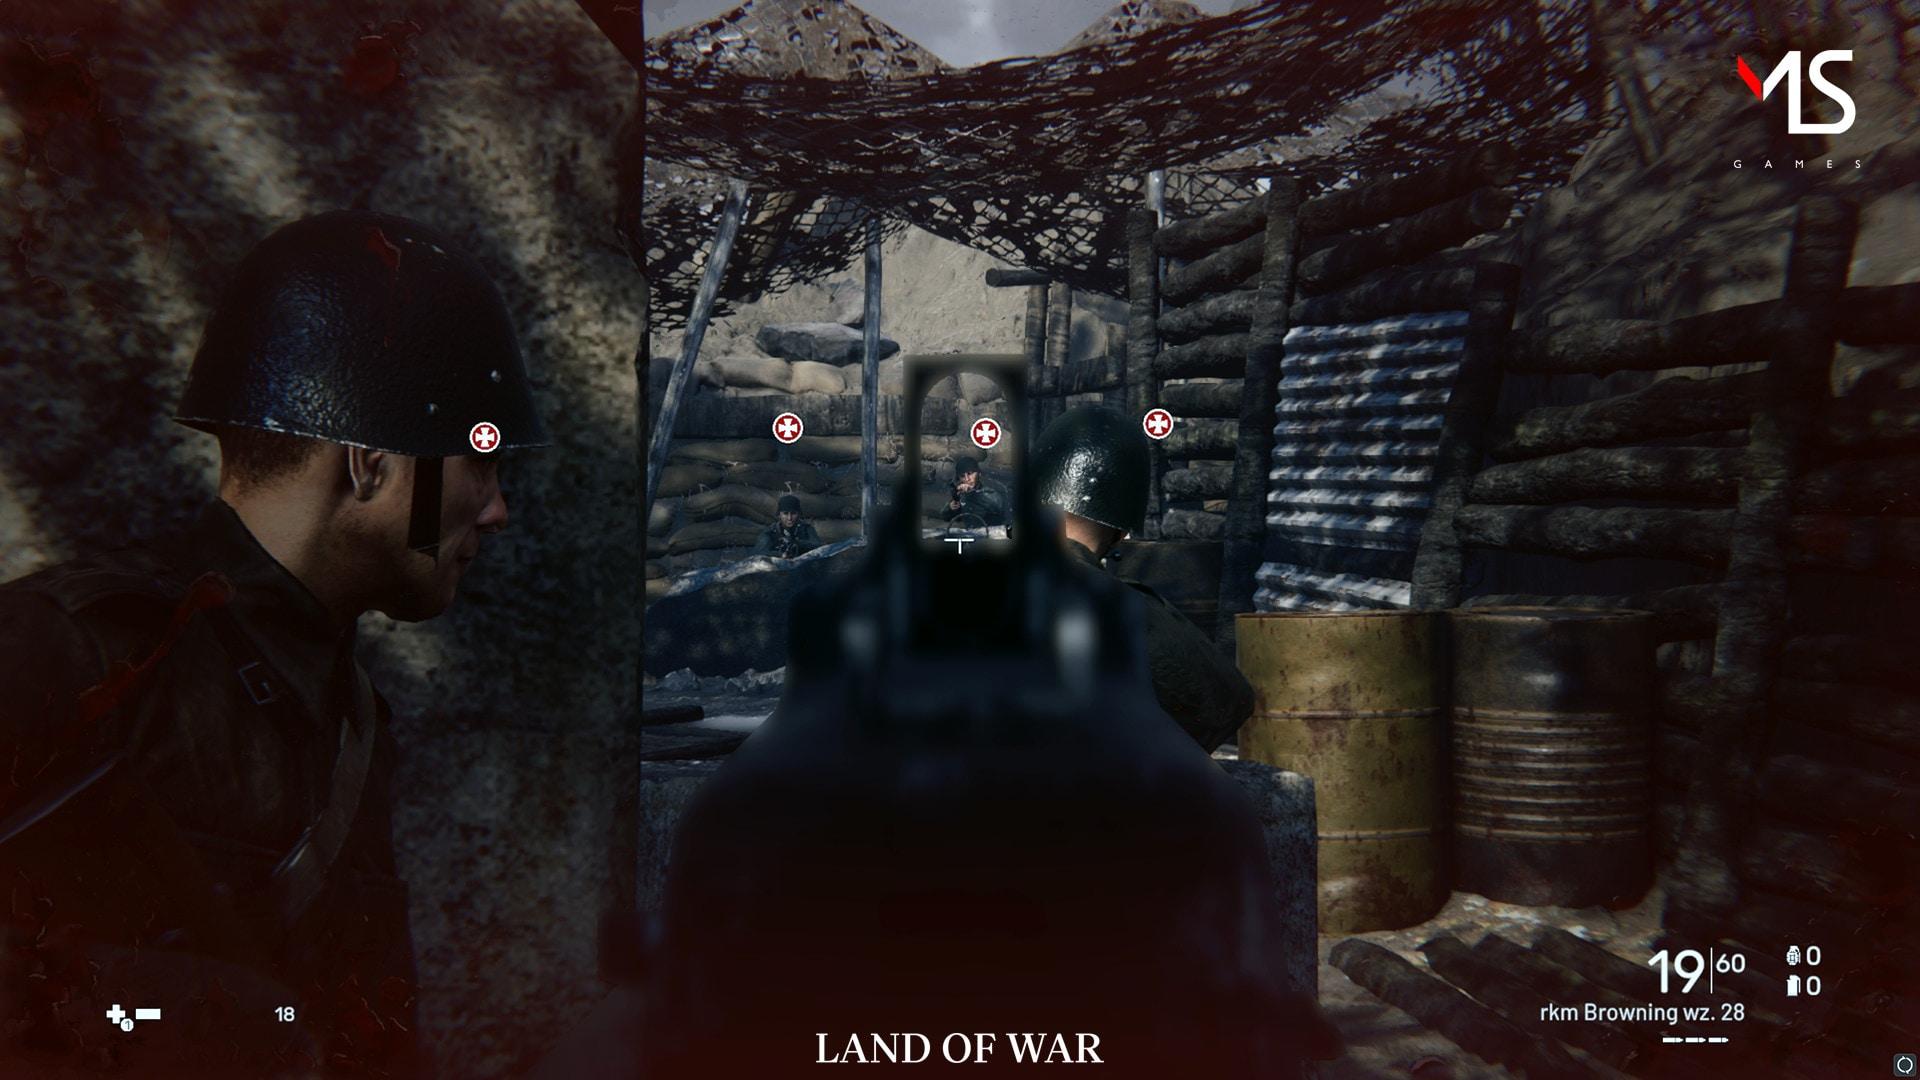 Land of War - The Beginning (PC) - Steam Gift - GLOBAL - 4